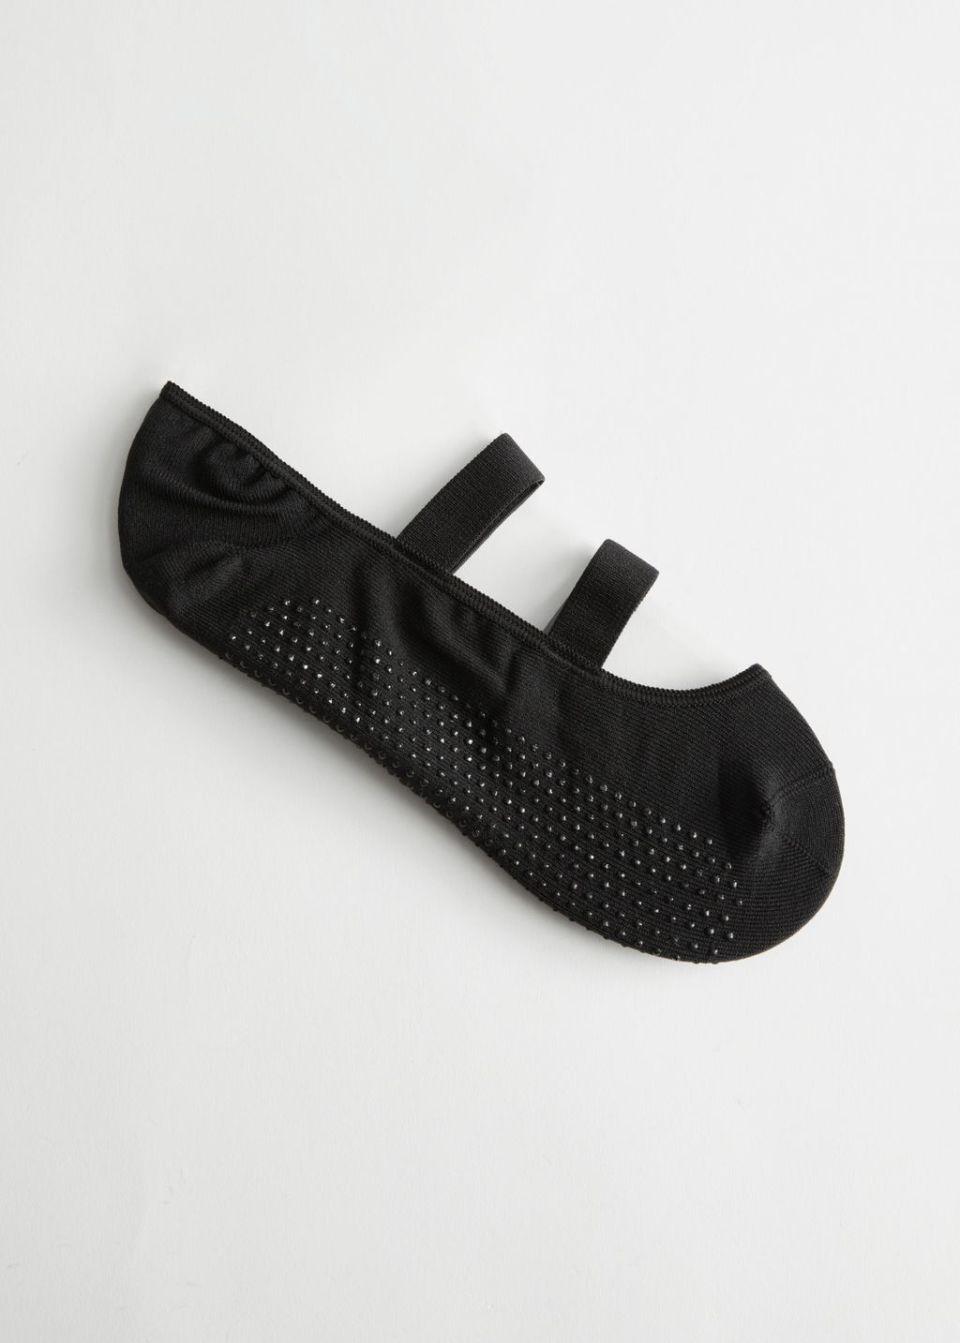 Anti-Slip Yoga Socks